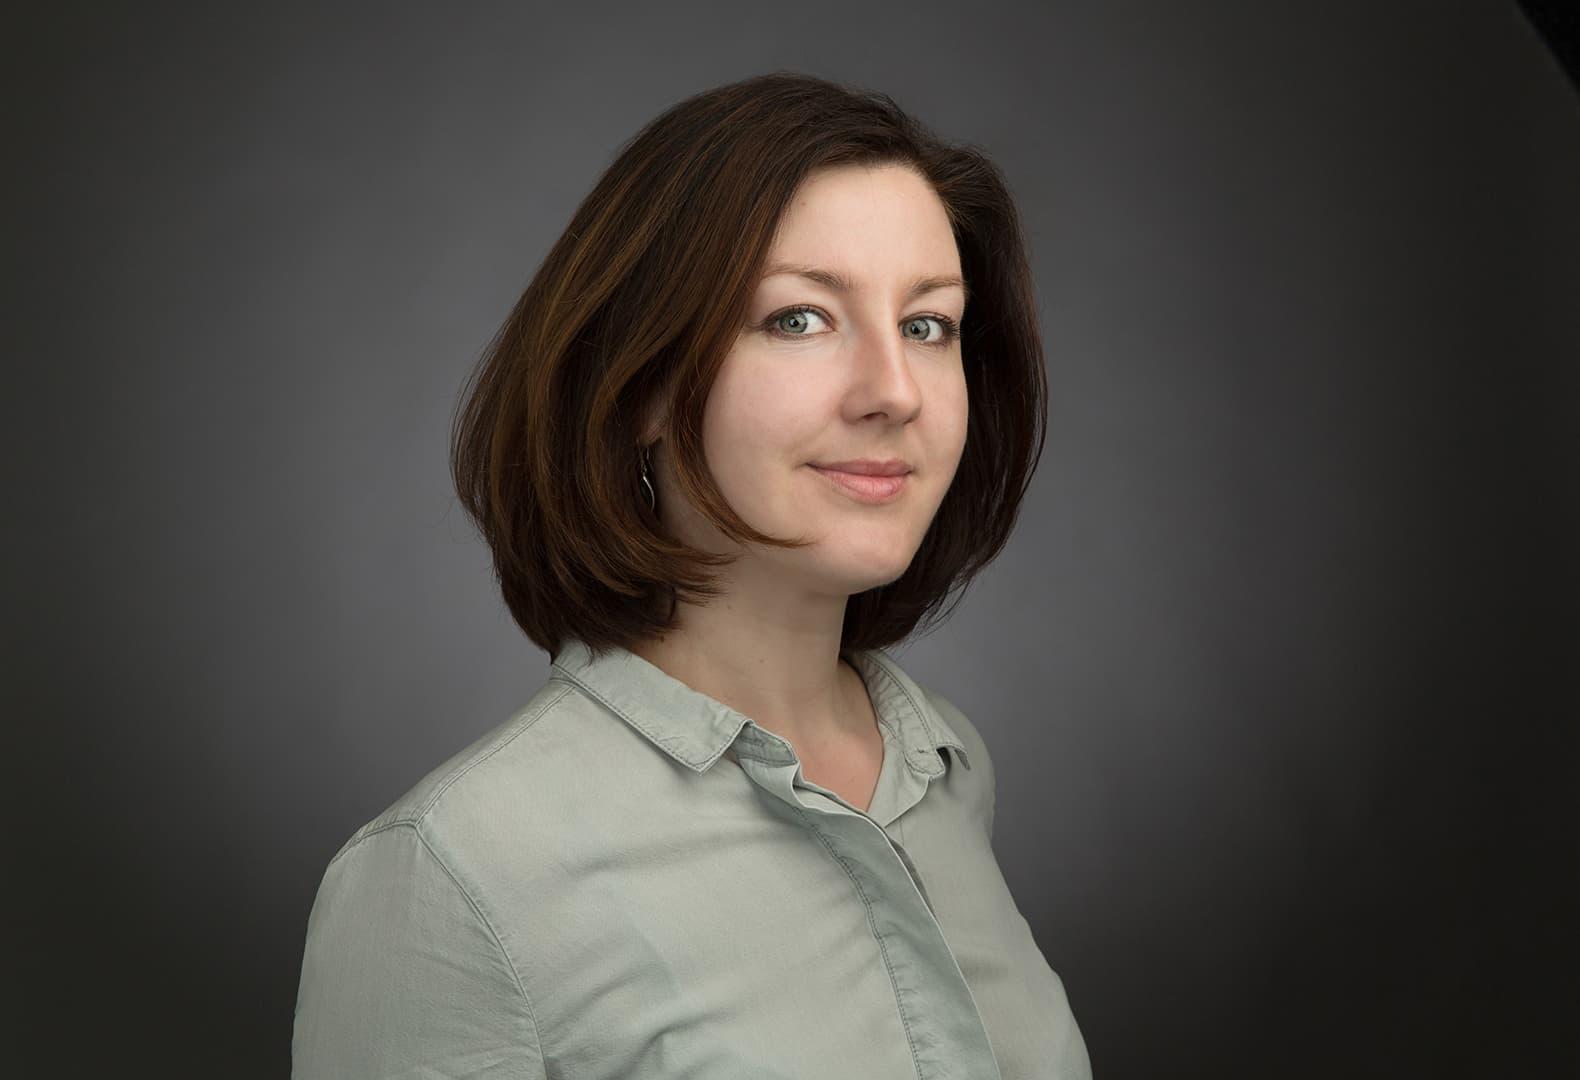 Наталья Маркевич. Фото предоставлено пресс-службой МАРШ